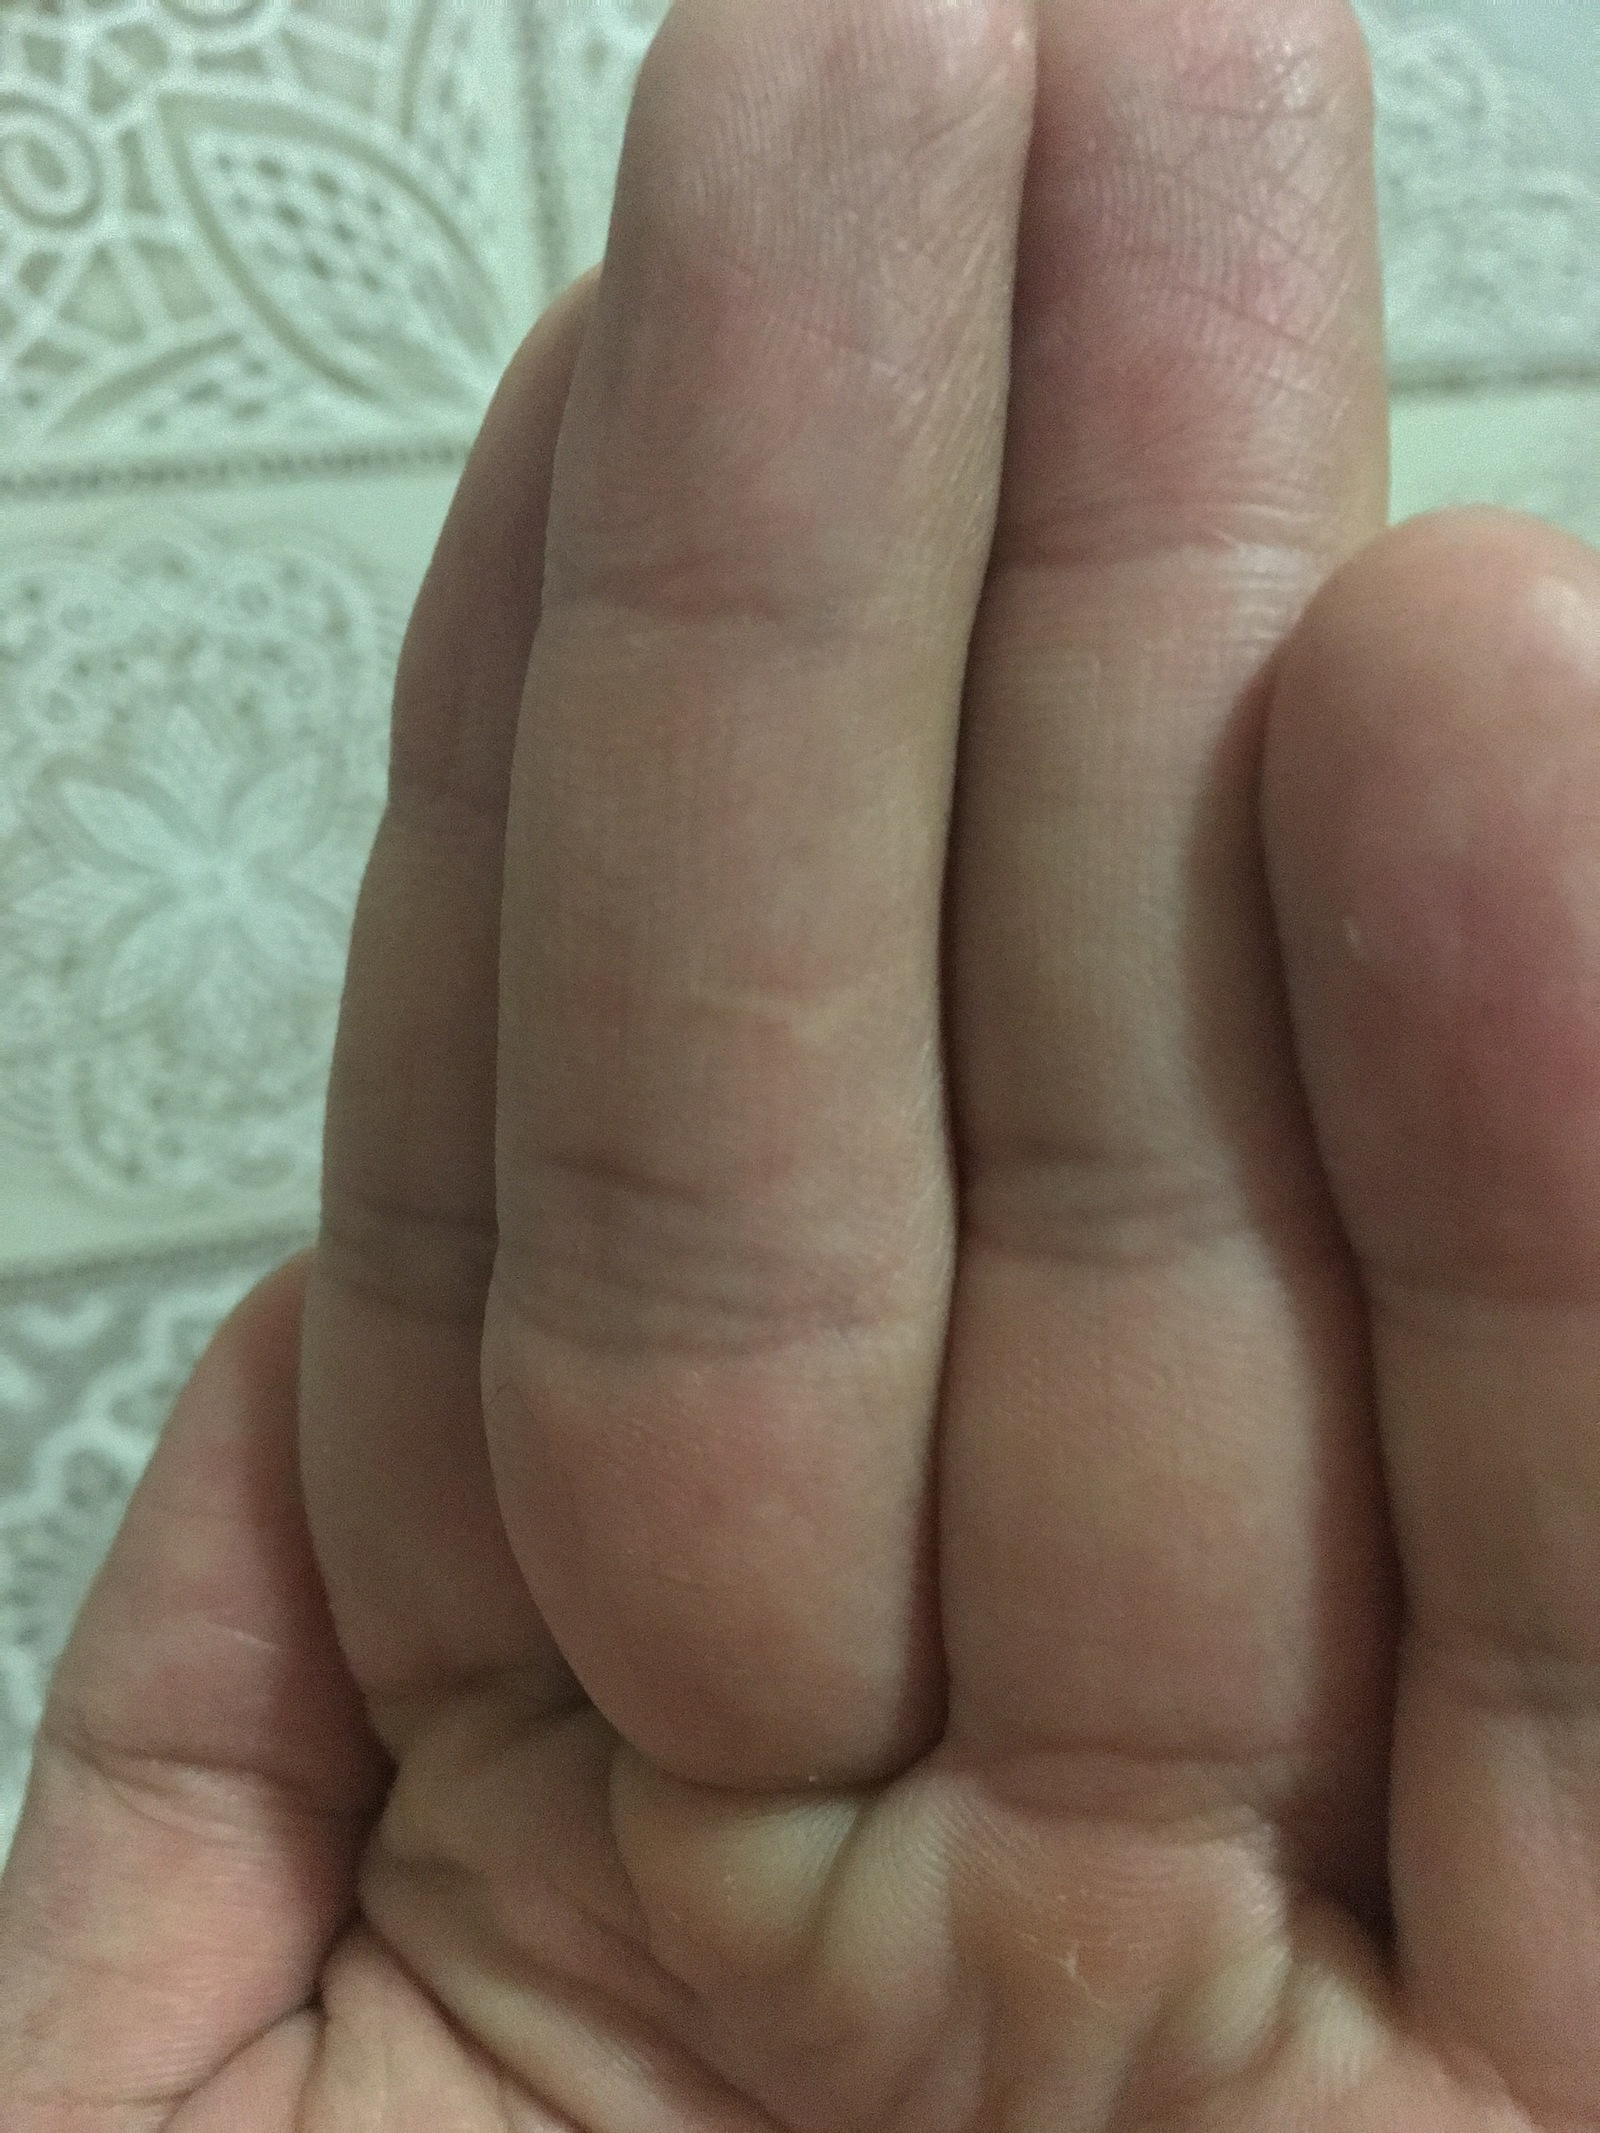 Палец в попе взрослого мужика